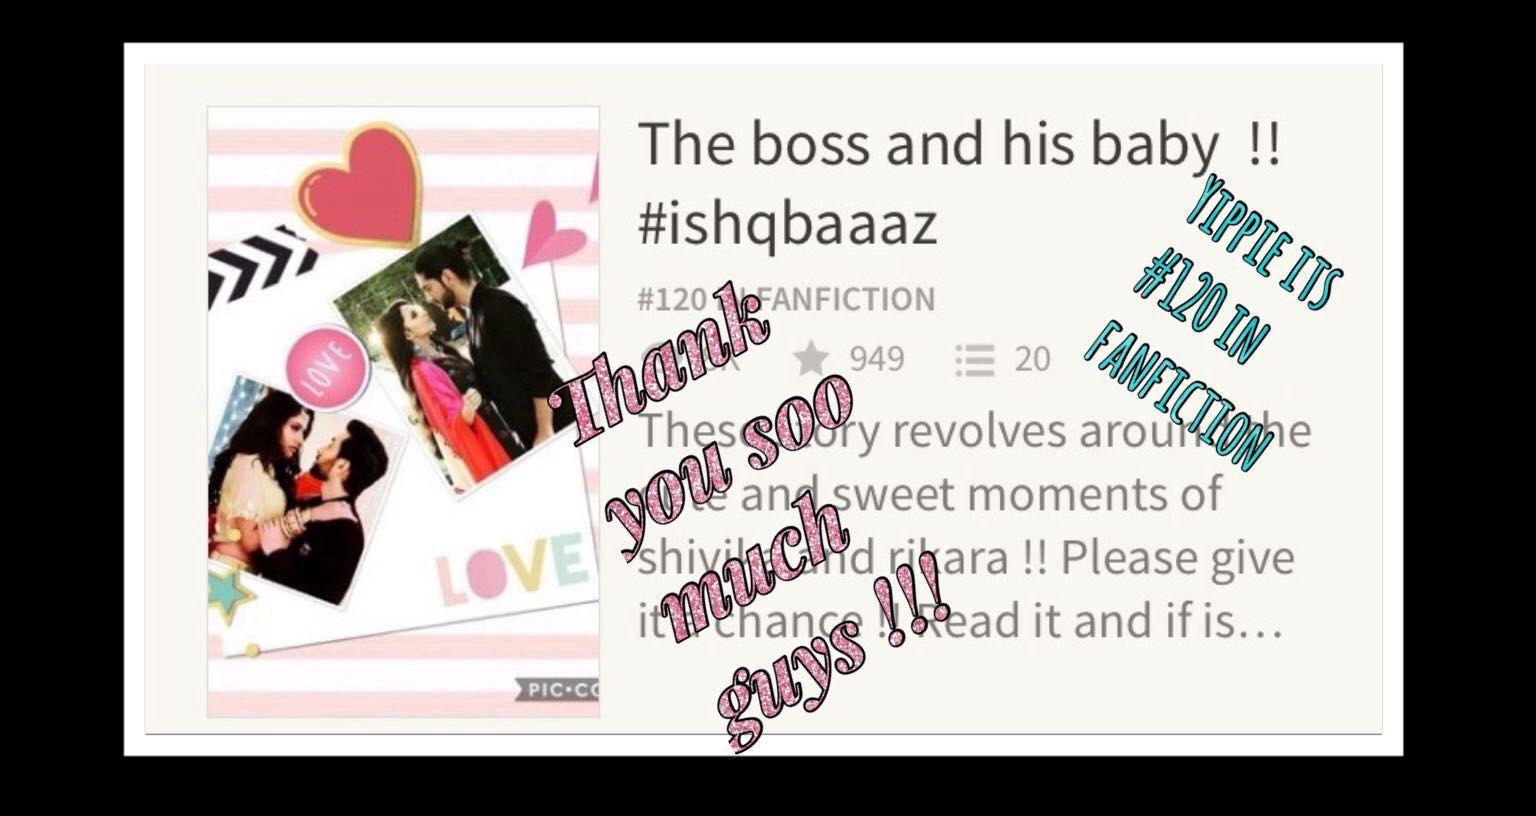 The boss and his baby #ishqbaaaz - Part 21 - Wattpad